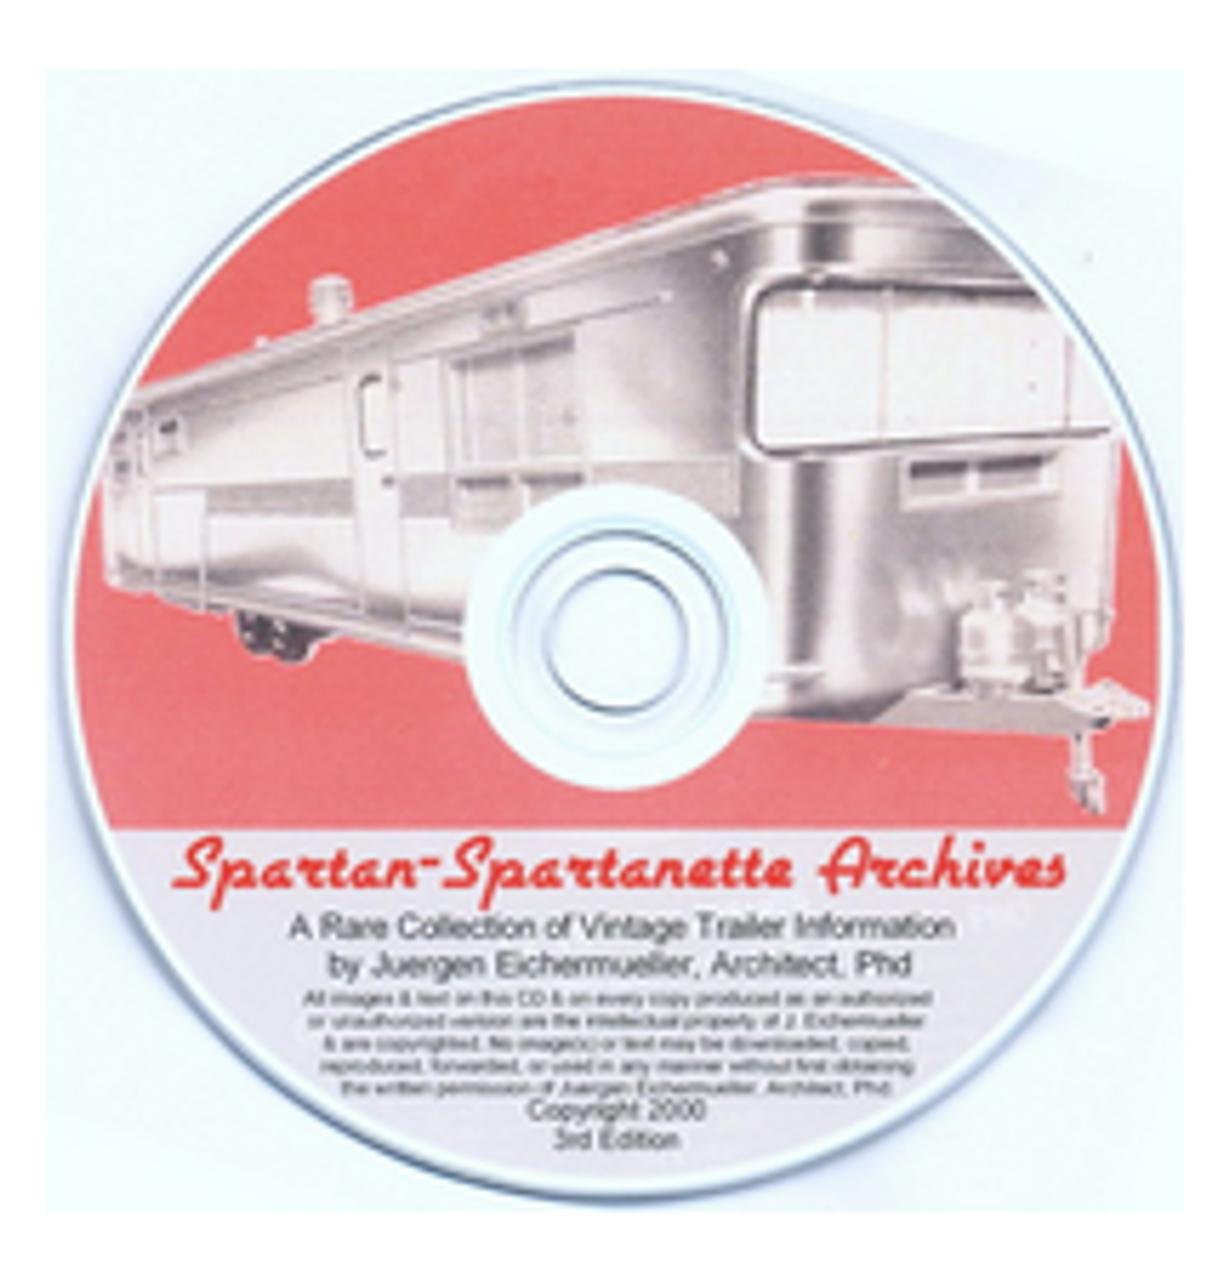 D-ROM Spartan - Spartanette Archives (CBL016)